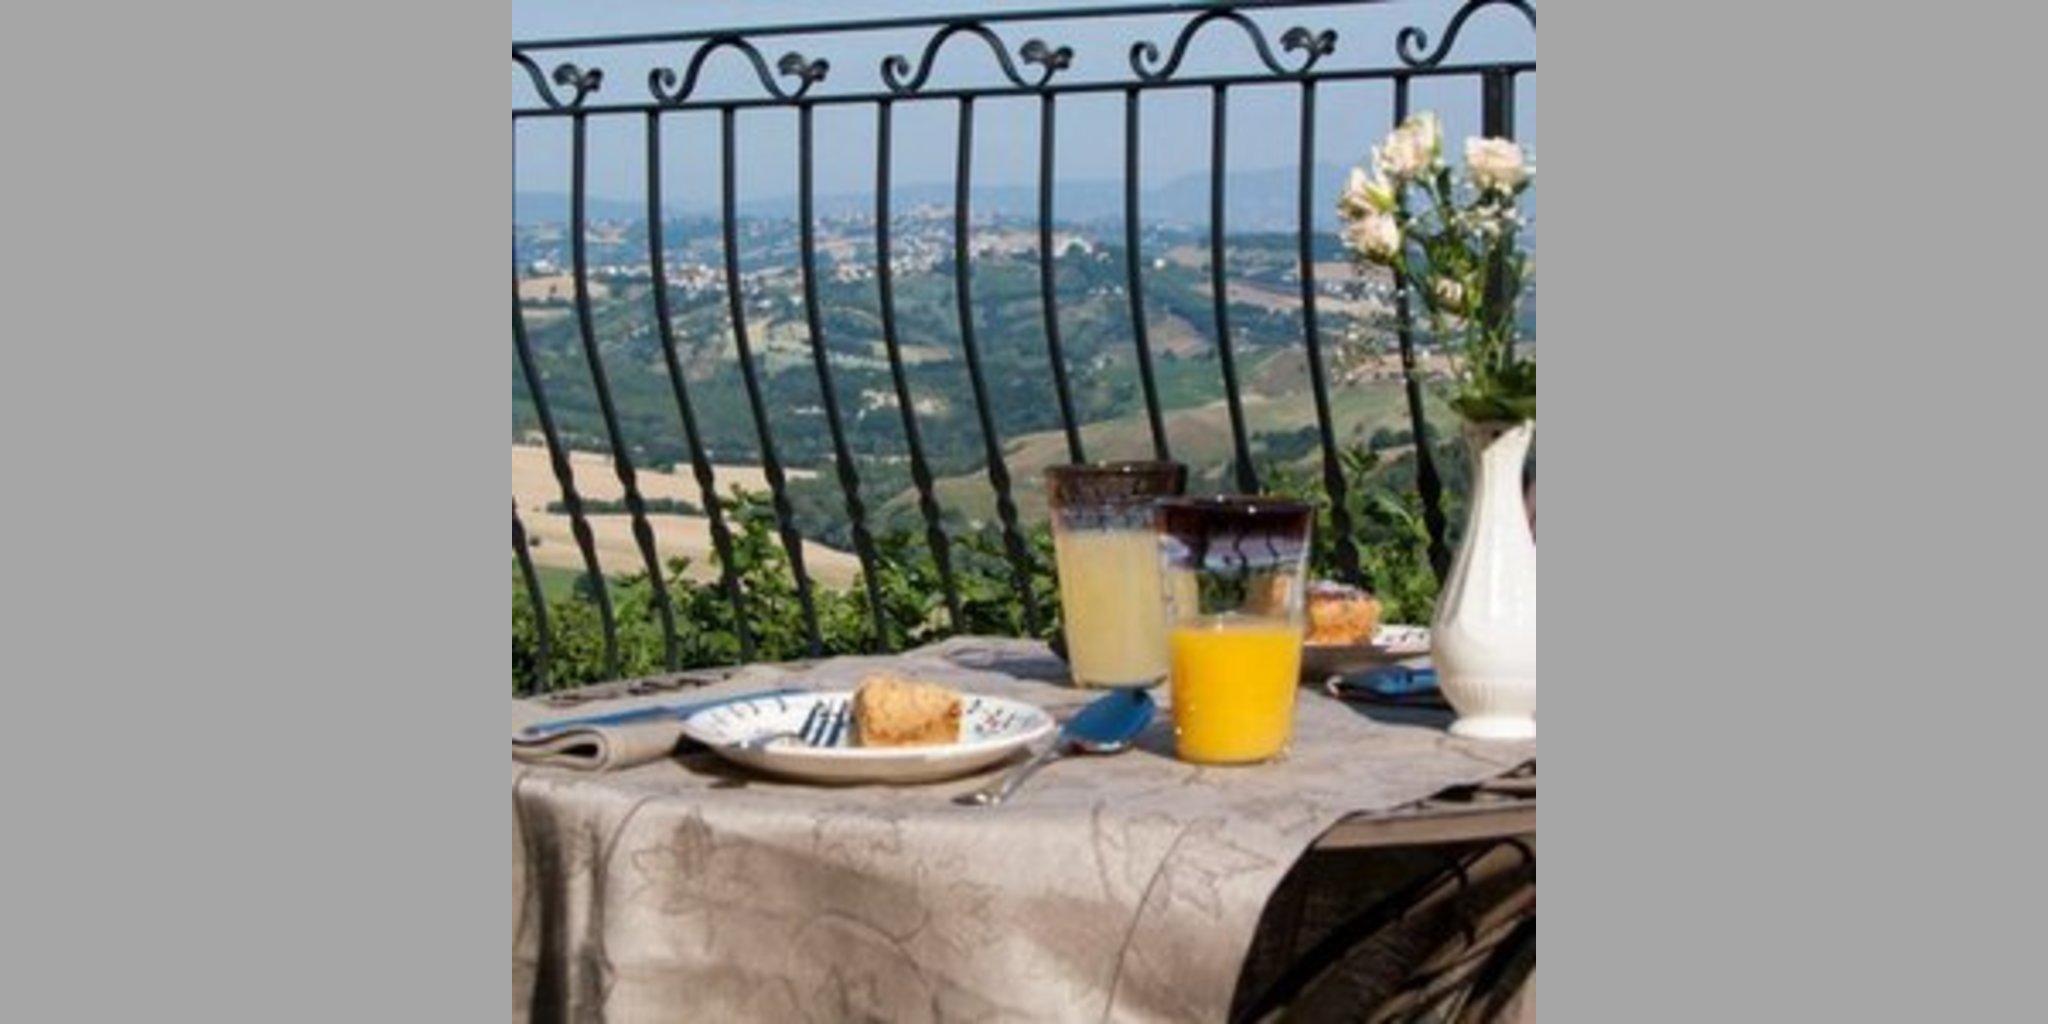 Bed & Breakfast Montegiorgio - Montegiorgio